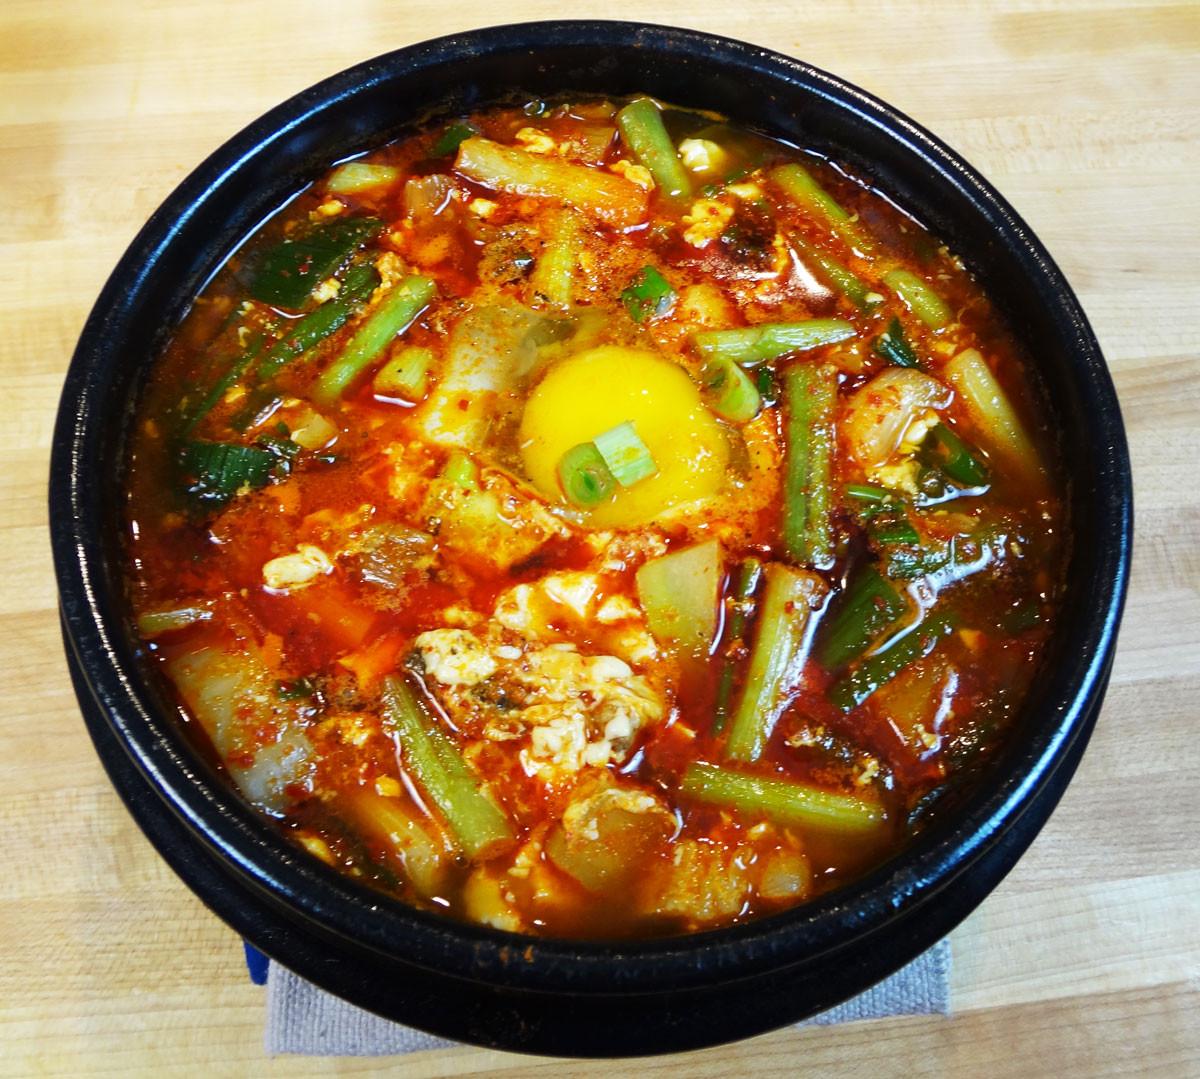 Soft Tofu Recipes  Haemul sundubu jjigae Spicy soft tofu stew with seafood